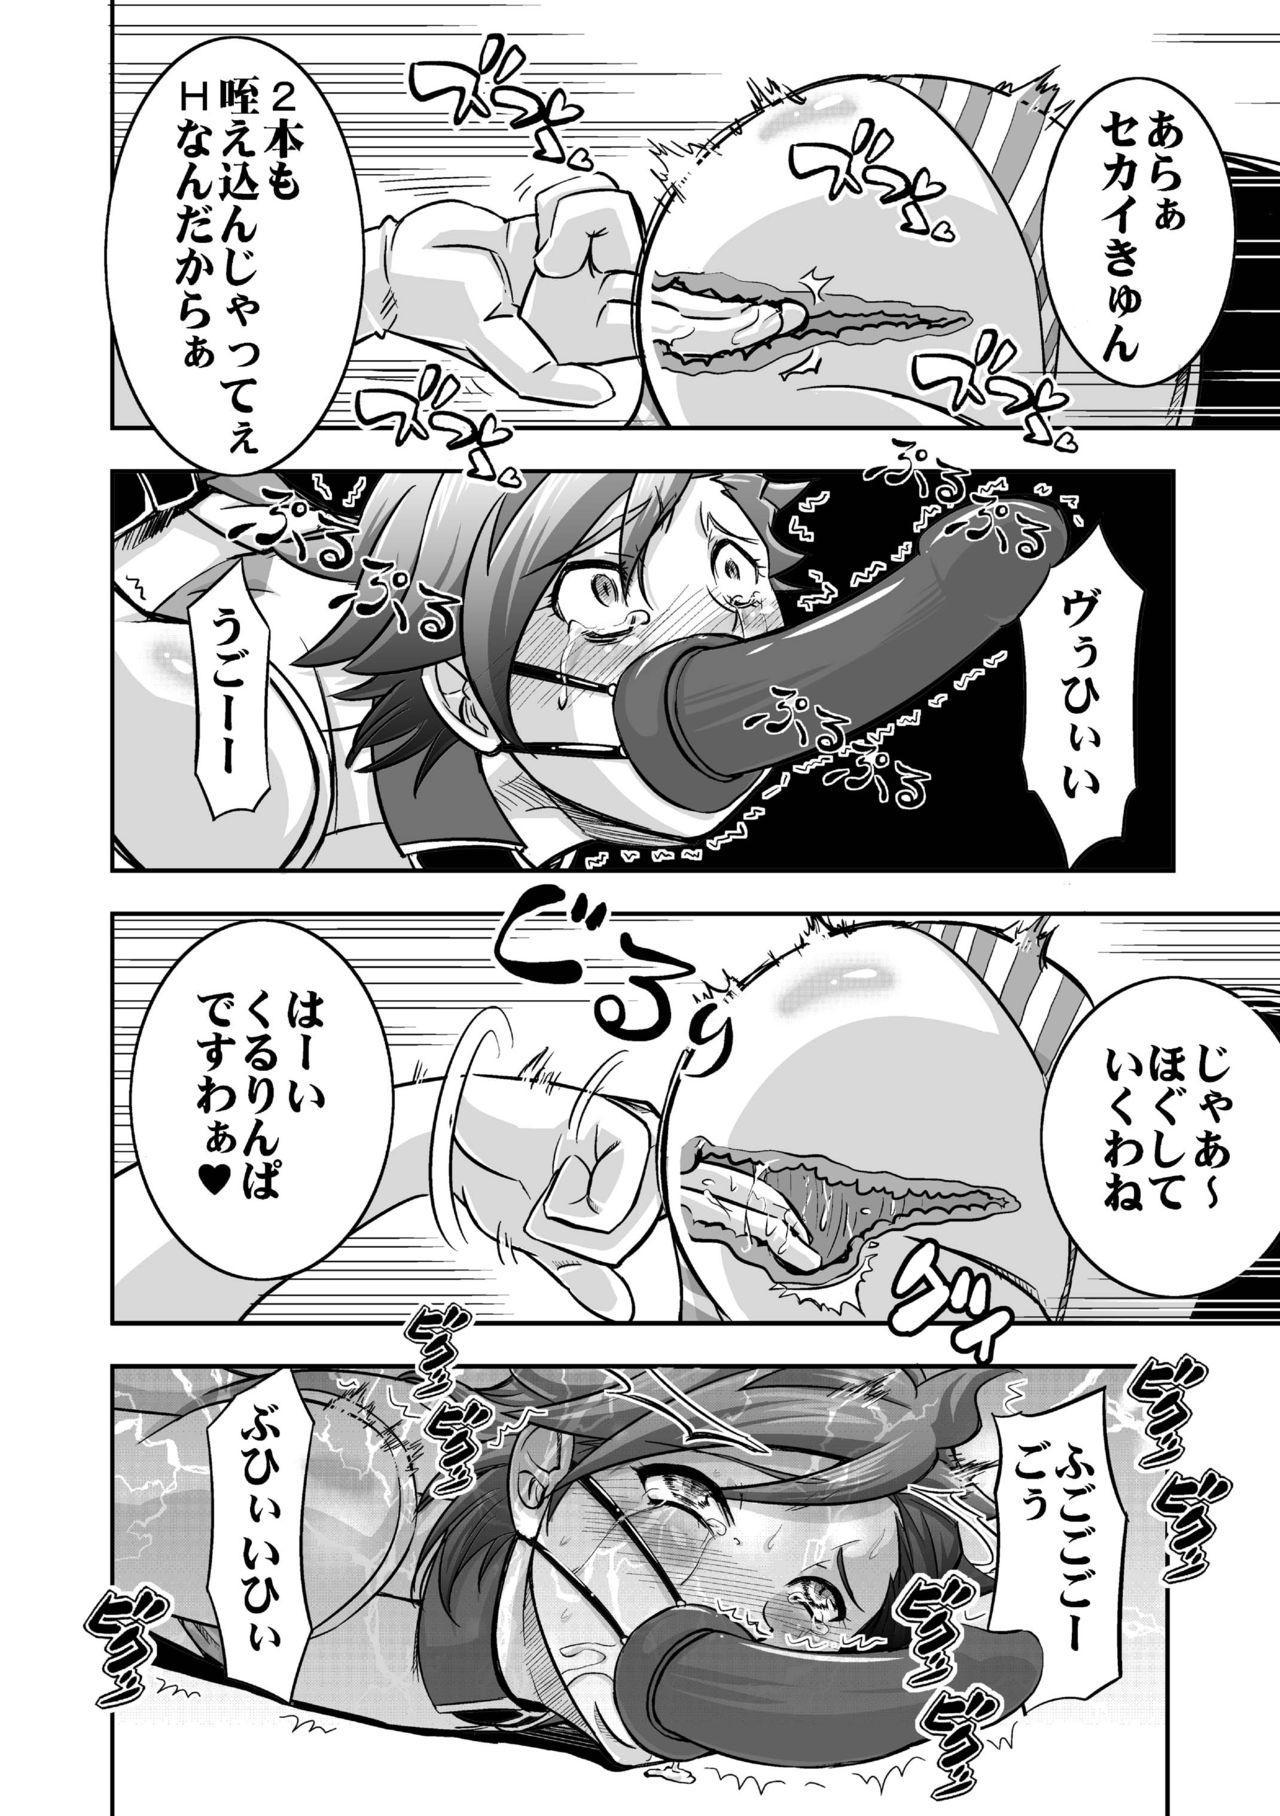 [Nisepakudo (Nisepakuman-san)] Plamo-kyou Chijo 3 -Futomashi- (Gundam Build Fighters Try) [Digital] 11